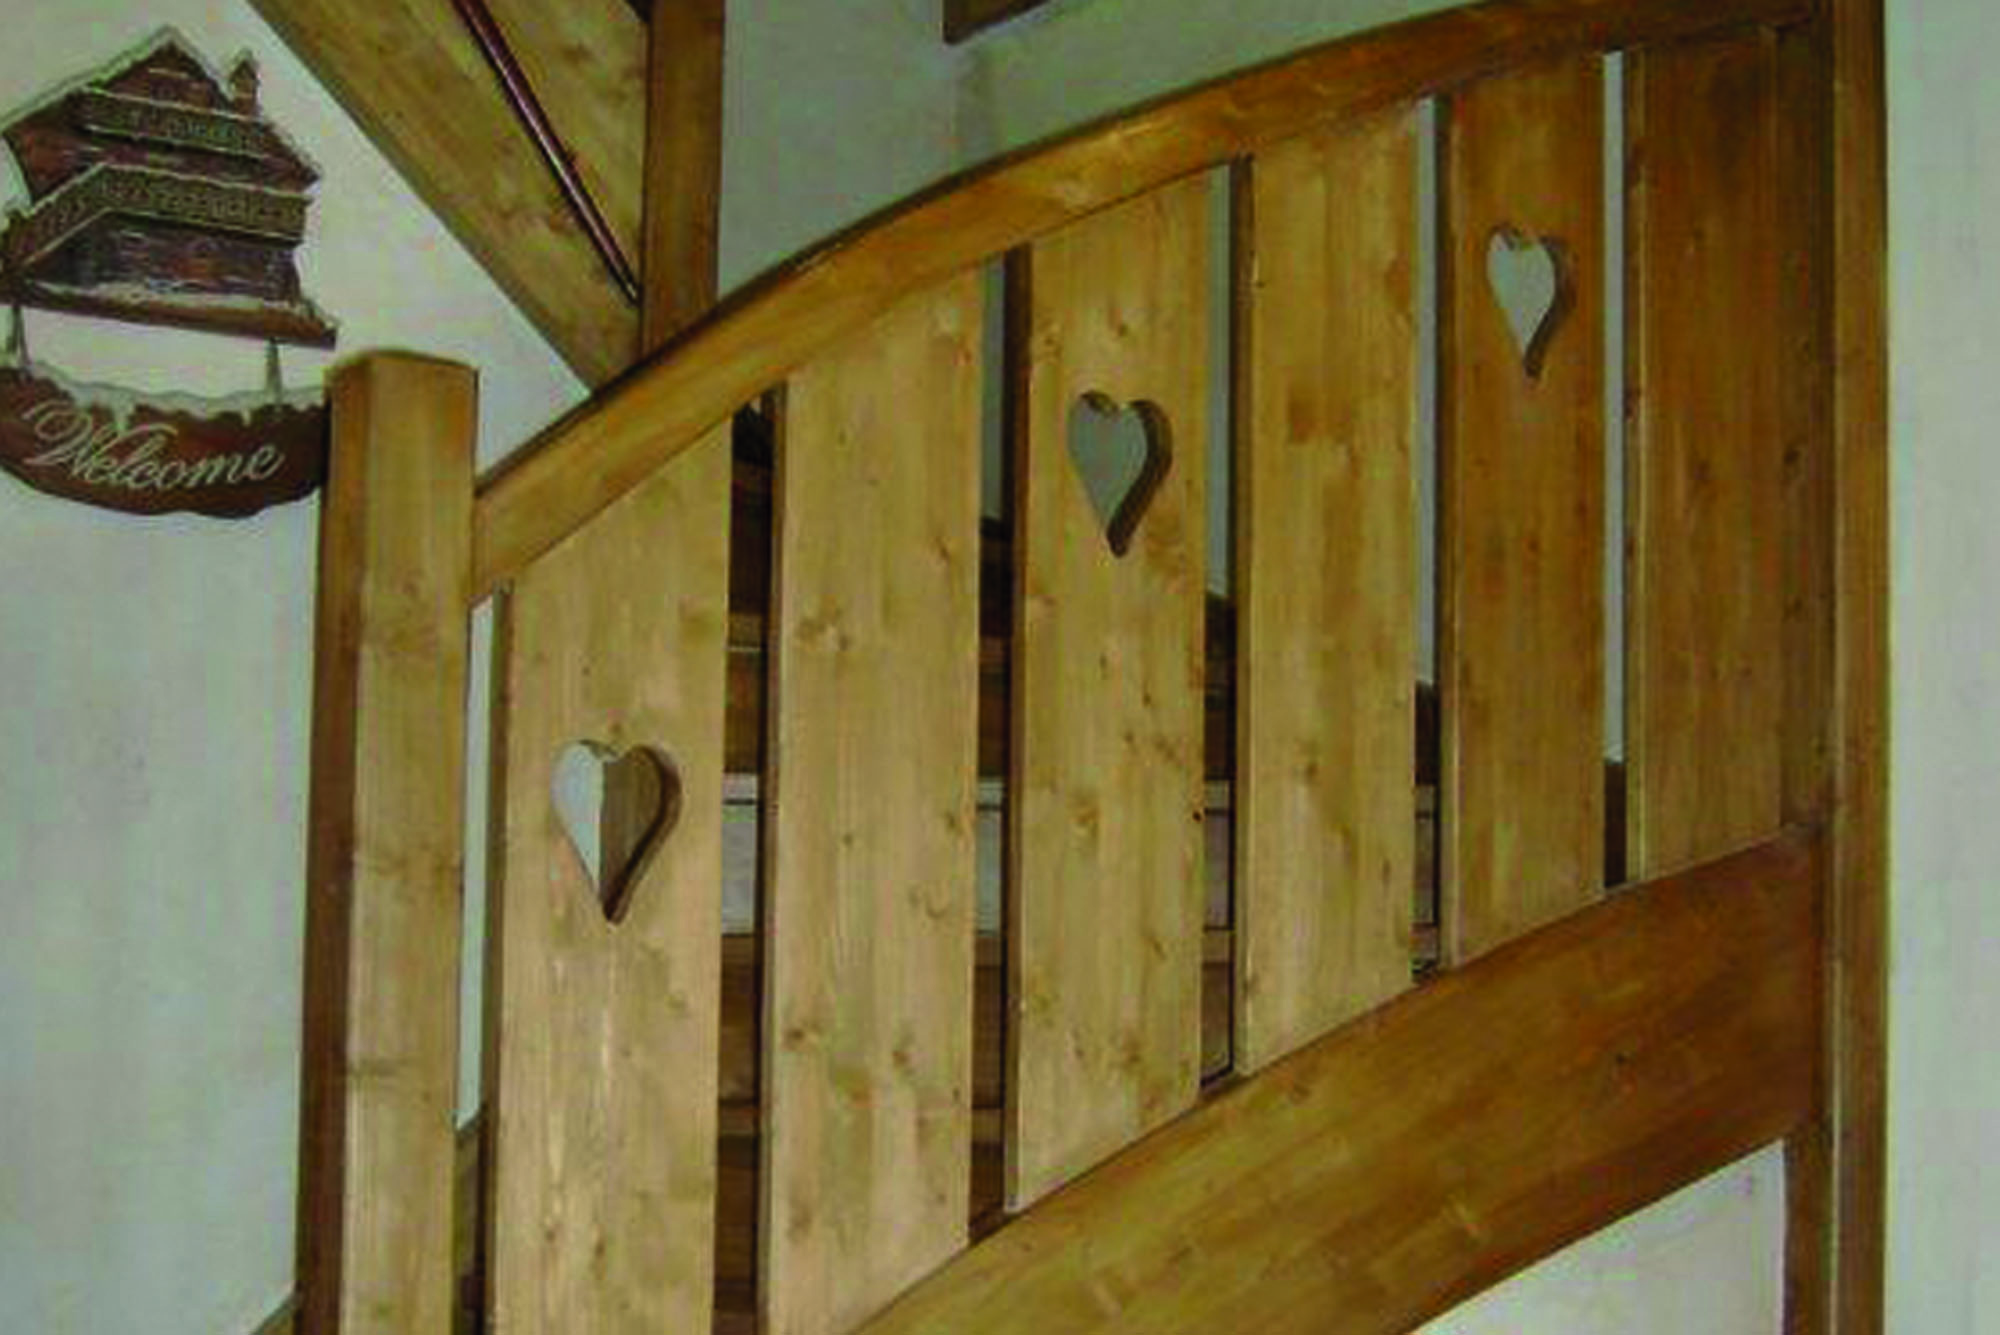 escalier bois rion bois. Black Bedroom Furniture Sets. Home Design Ideas